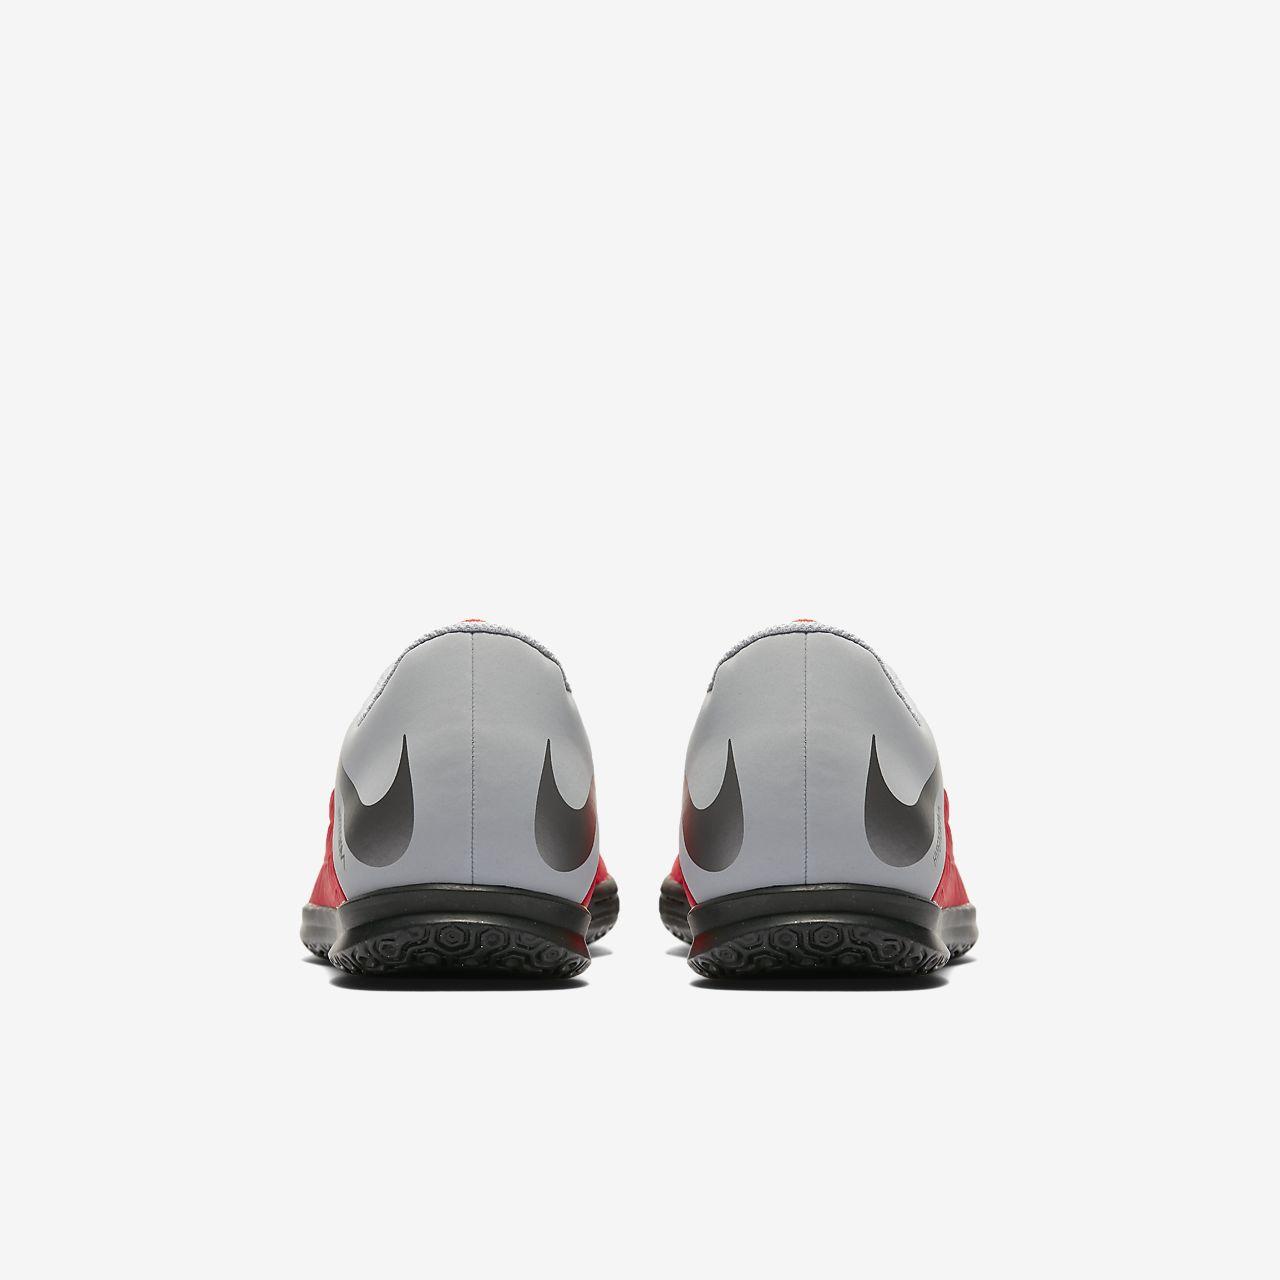 meet 59776 c6921 ... Chaussure de football en salle Nike HypervenomX Phantom III Club IC